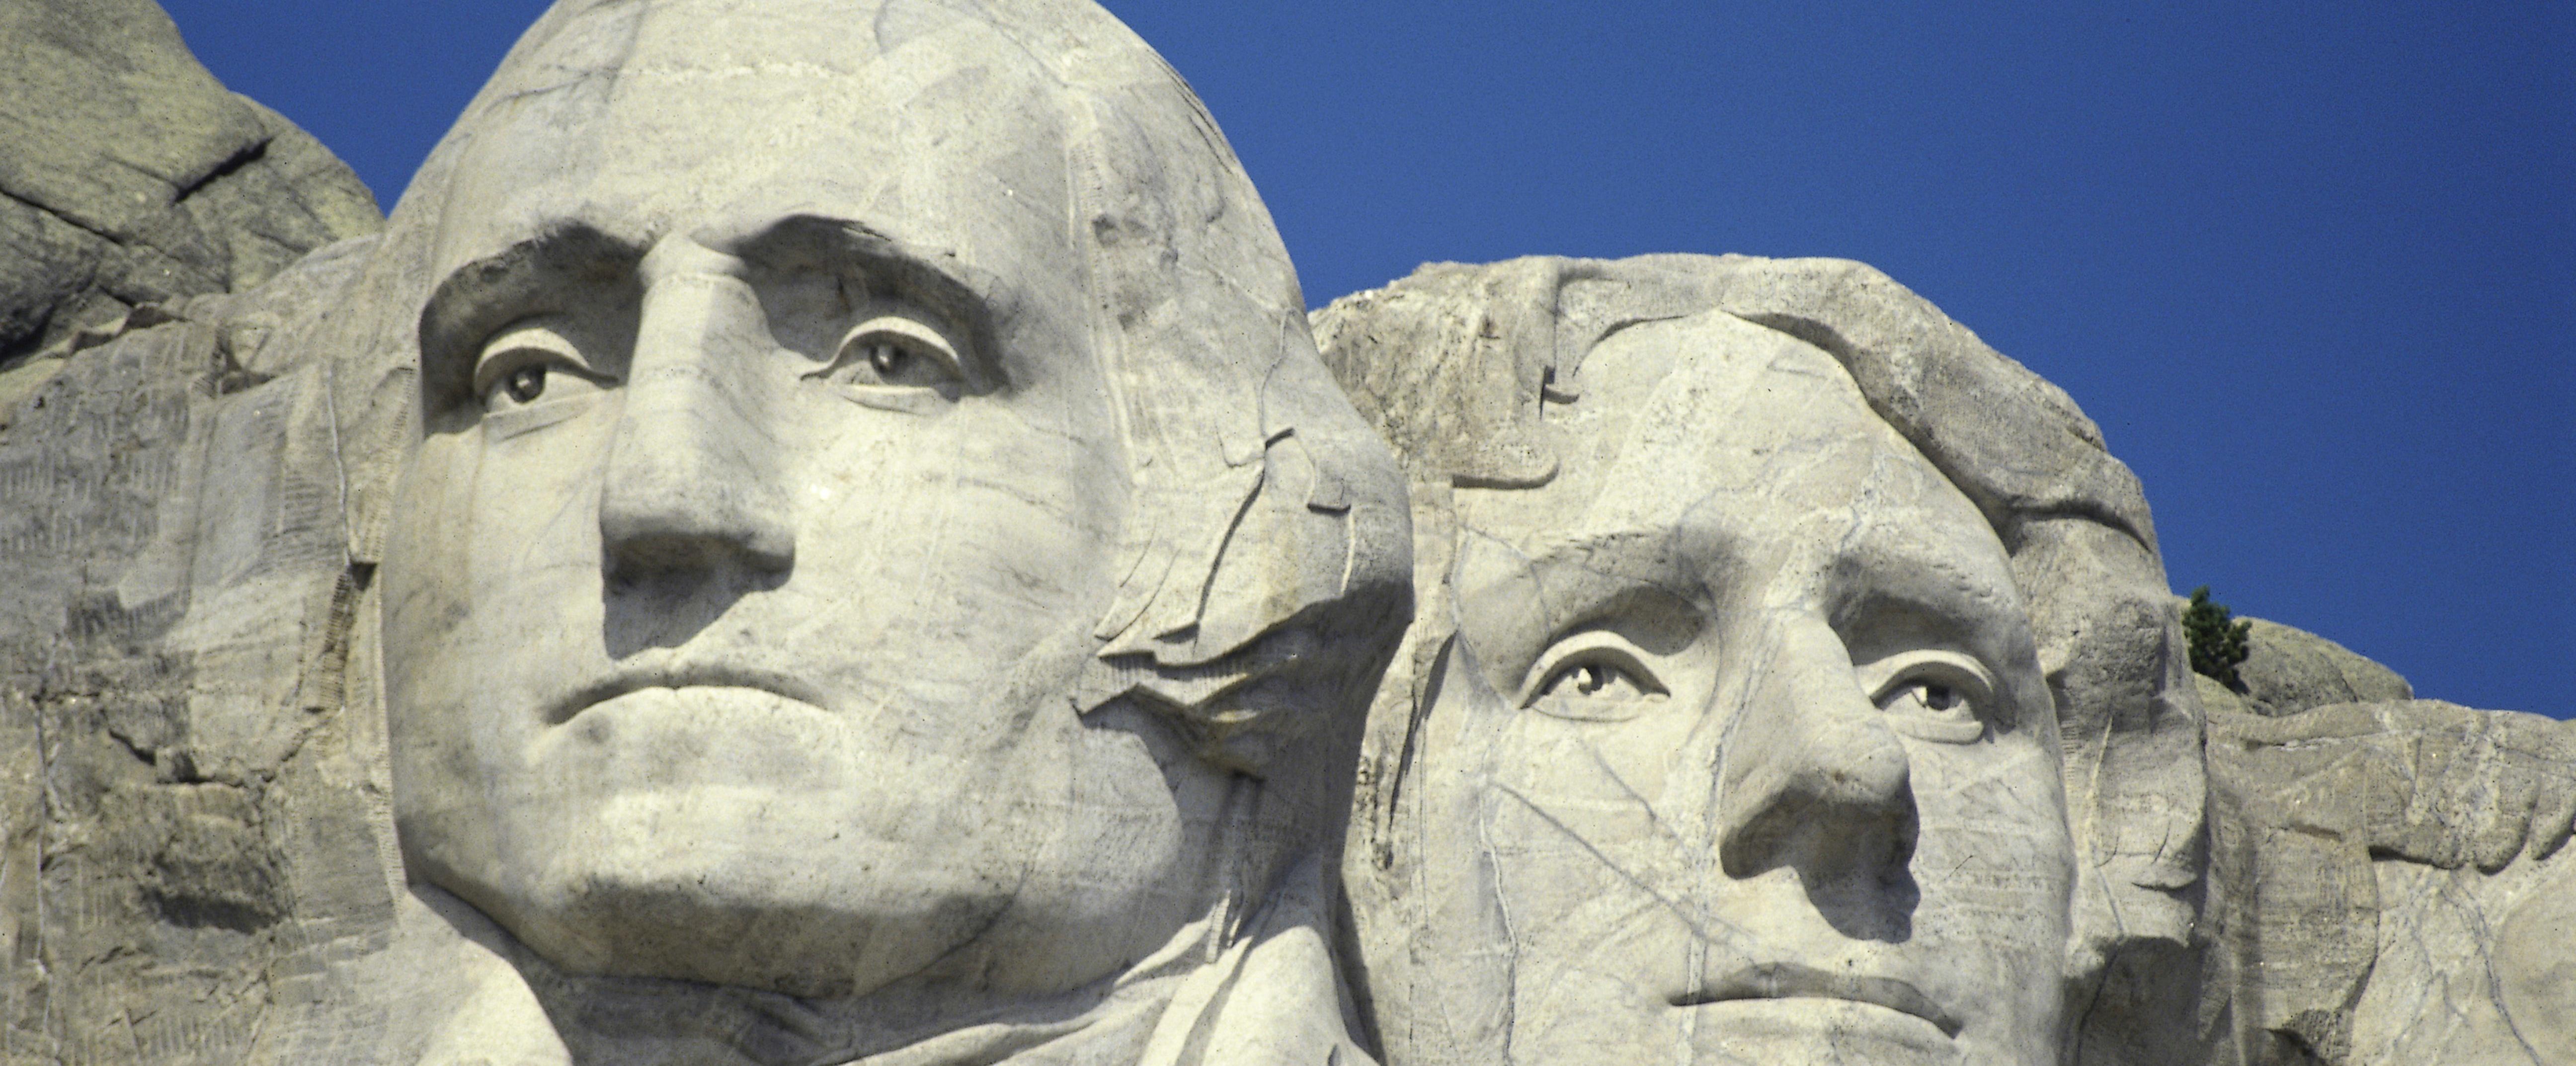 The No-Nonsense Strategy Behind George Washington's Productivity